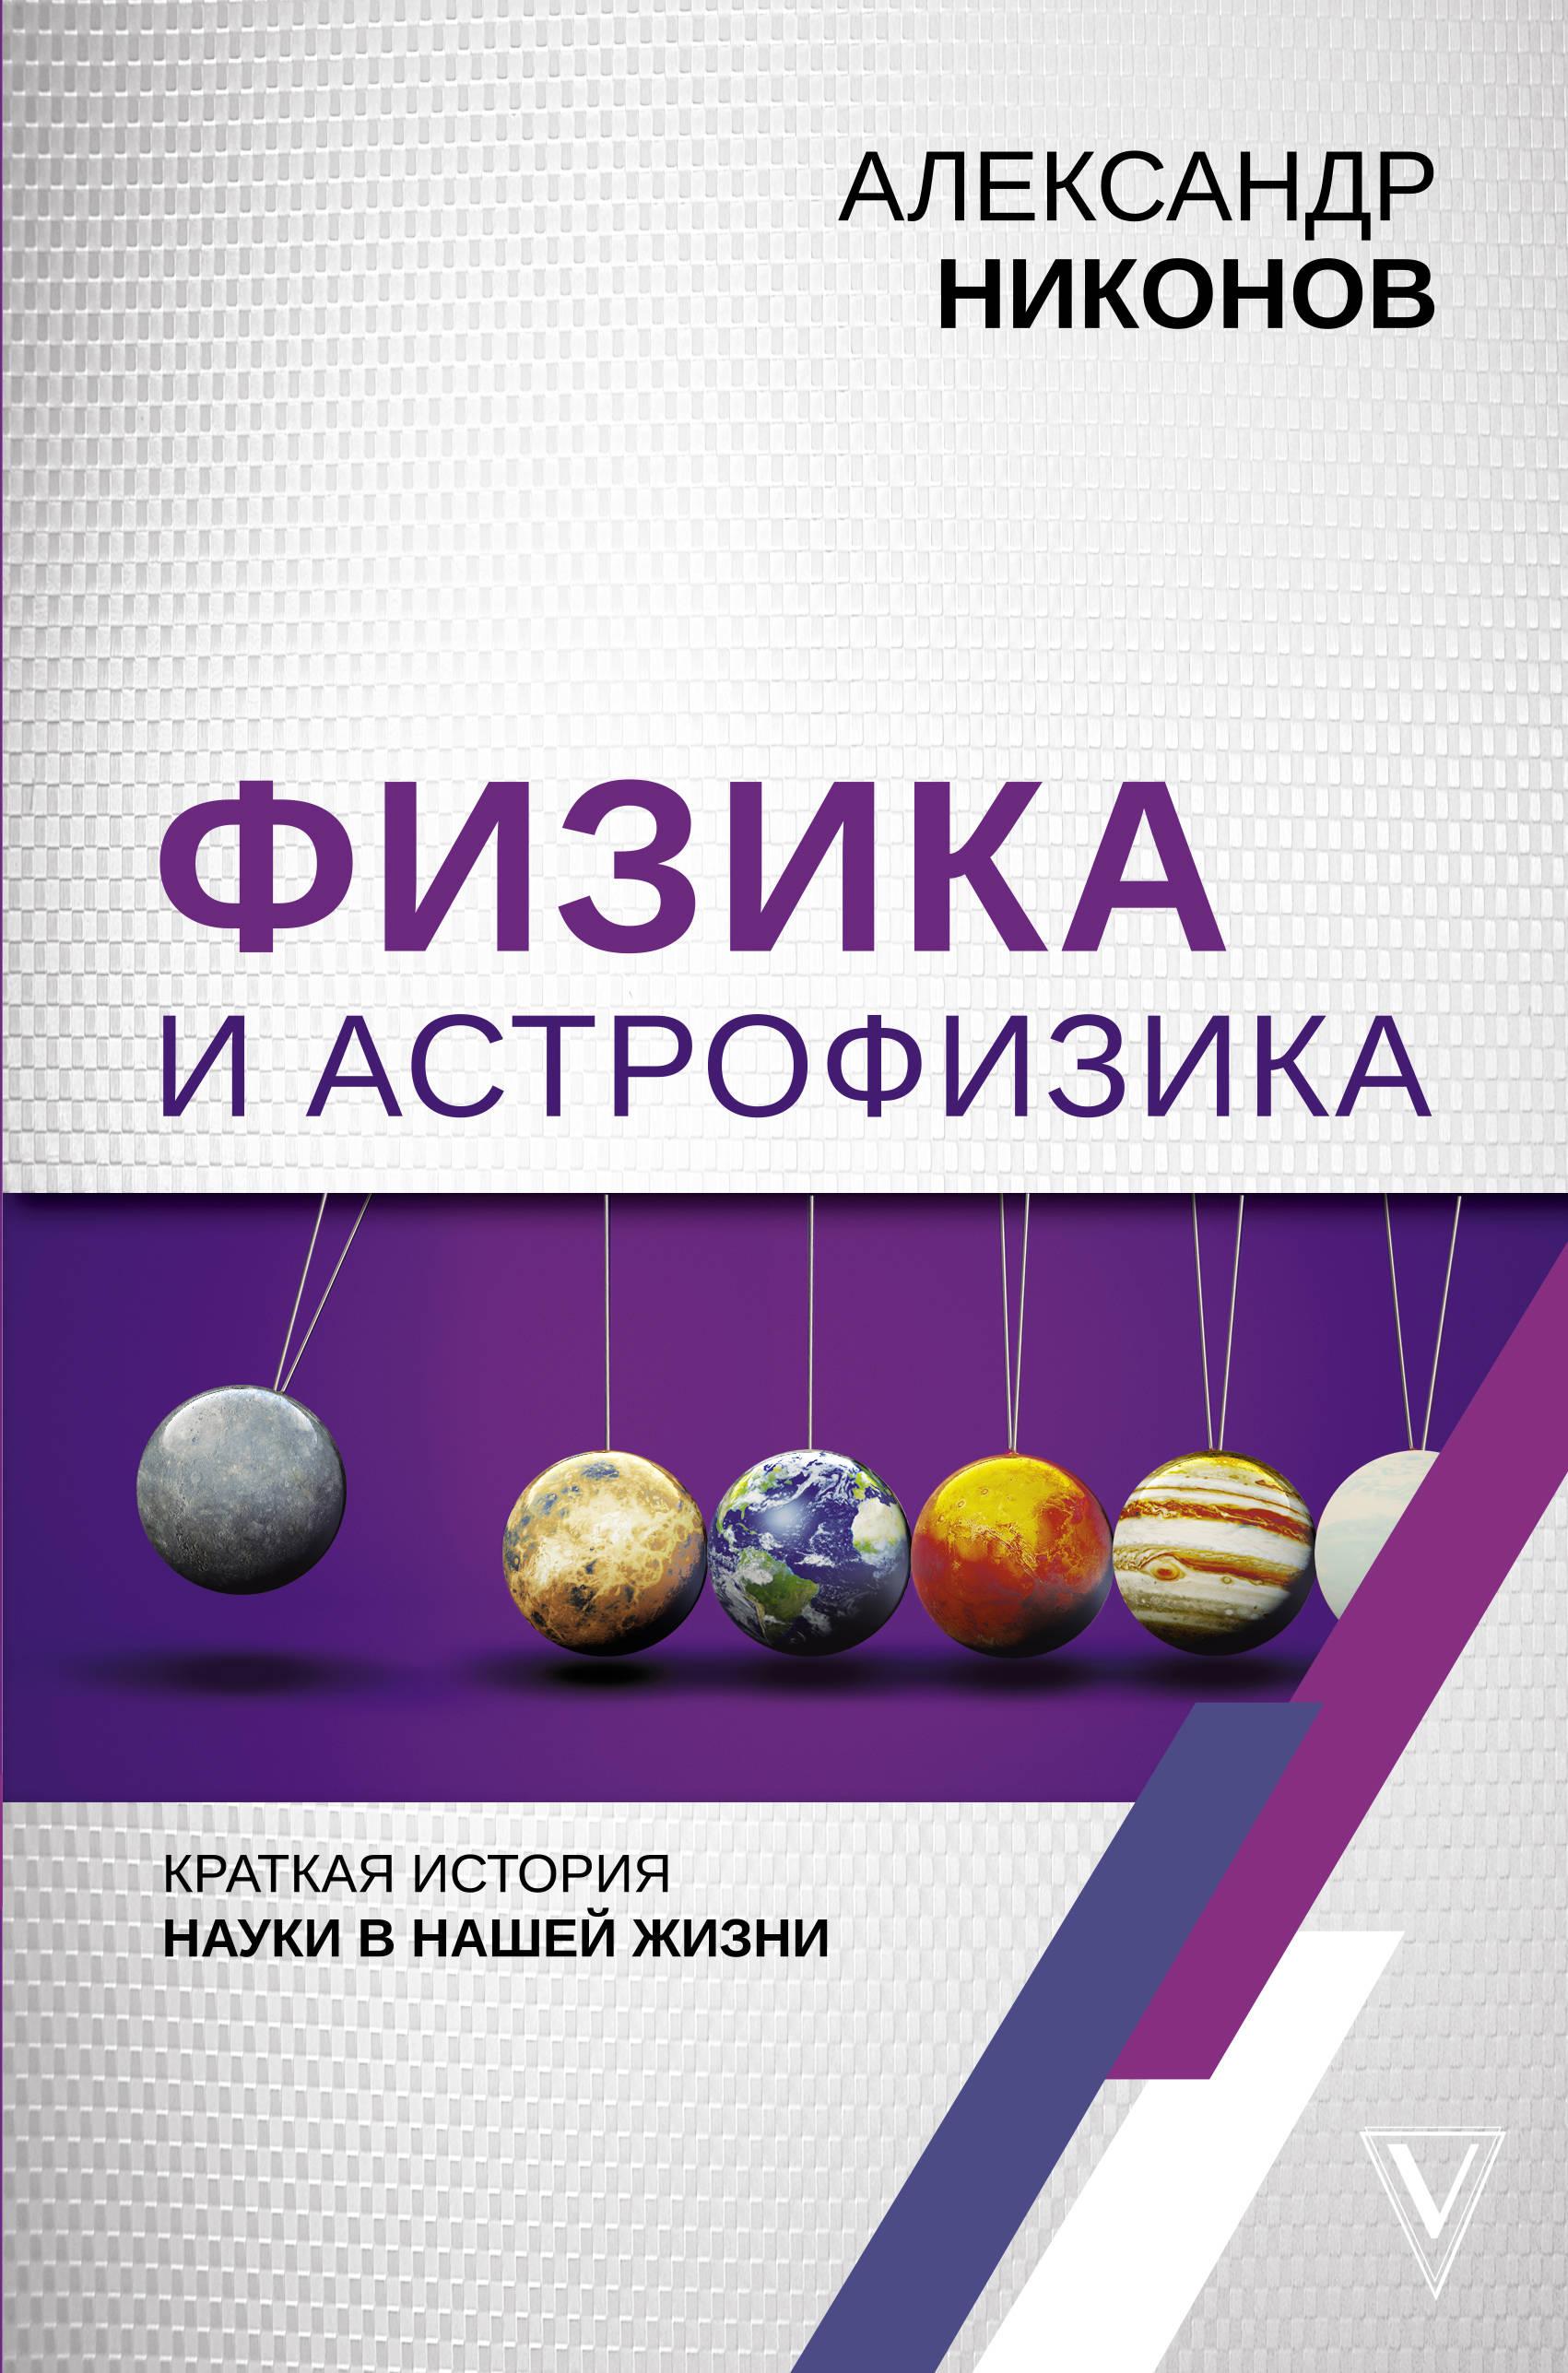 Fizika i astrofizika: kratkaja istorija nauki v nashej zhizni